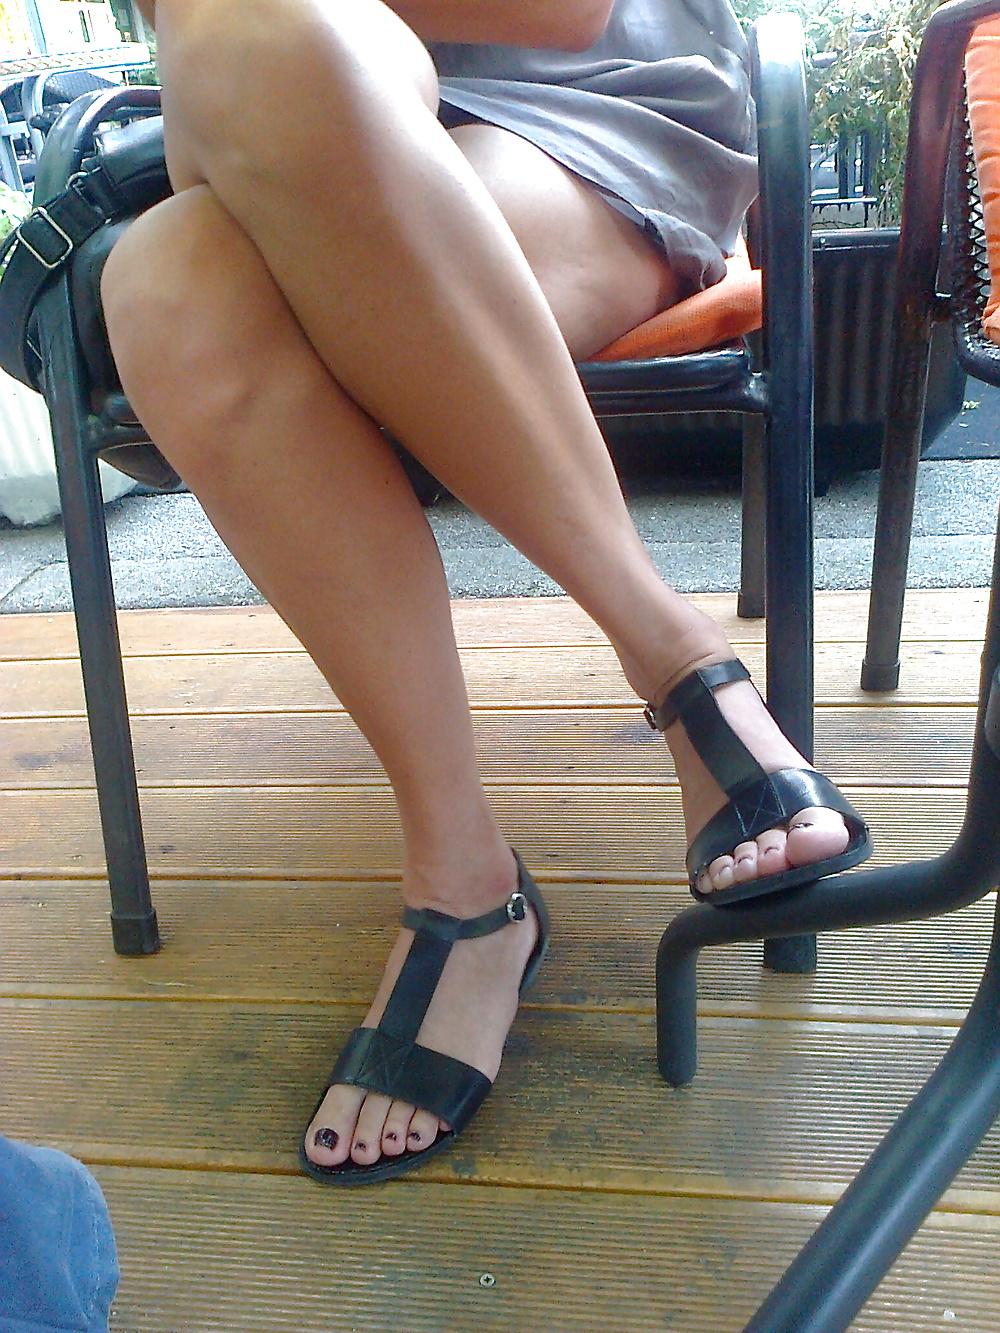 Candid Feet Captured Candid Milf Feet